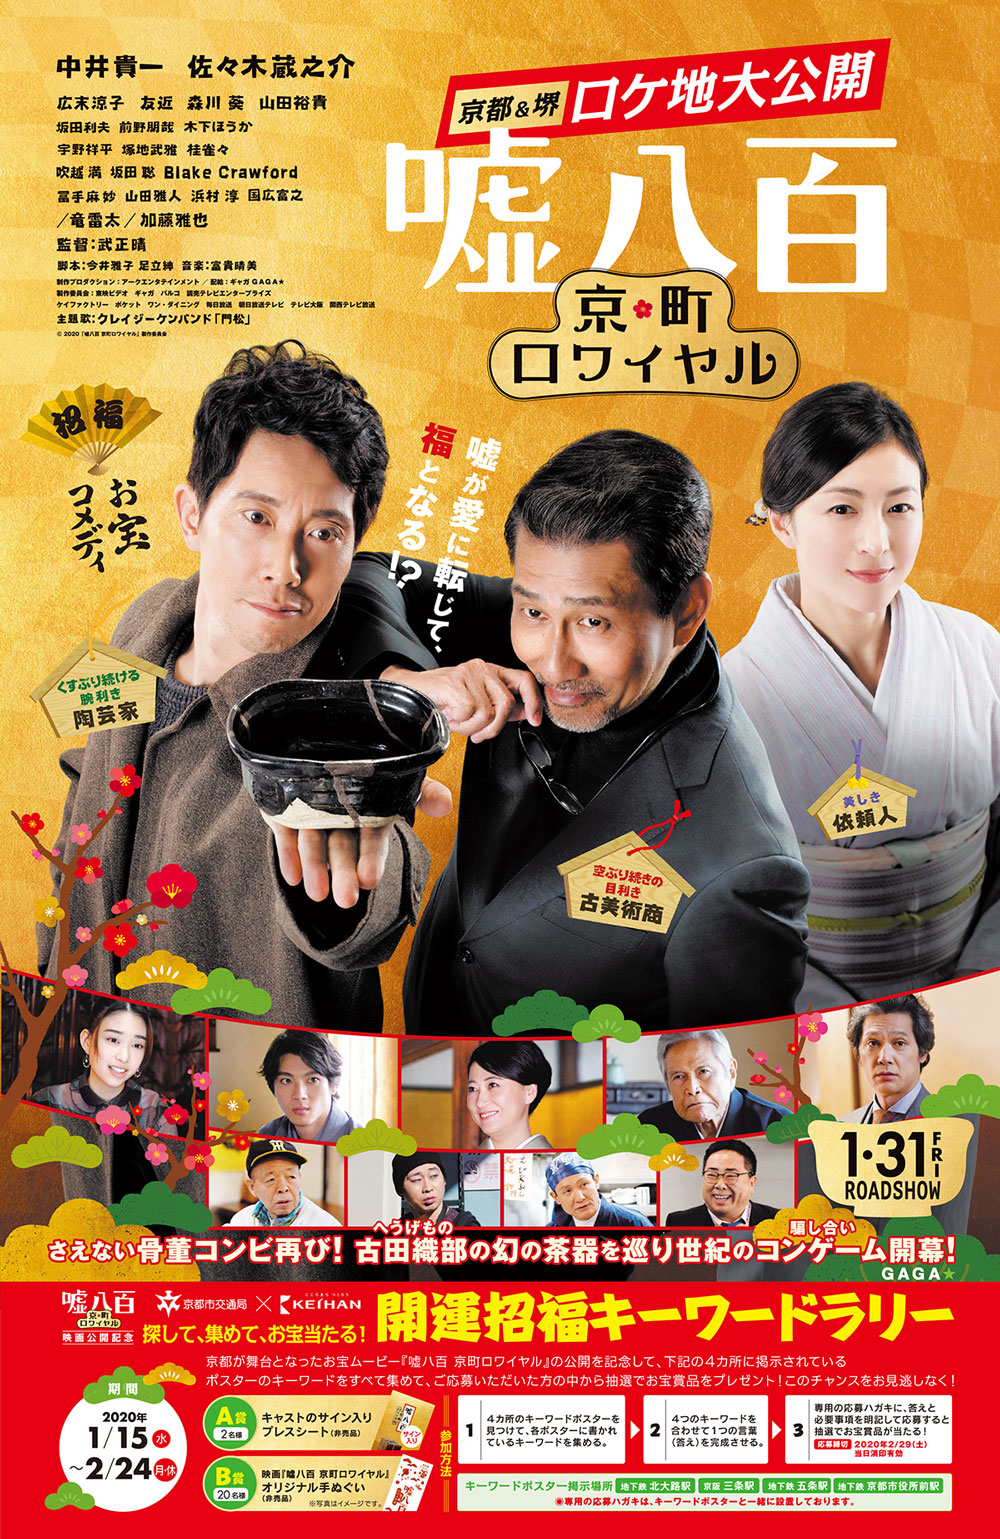 NEWS|映画『嘘八百 京町ロワイヤル』 公式サイト